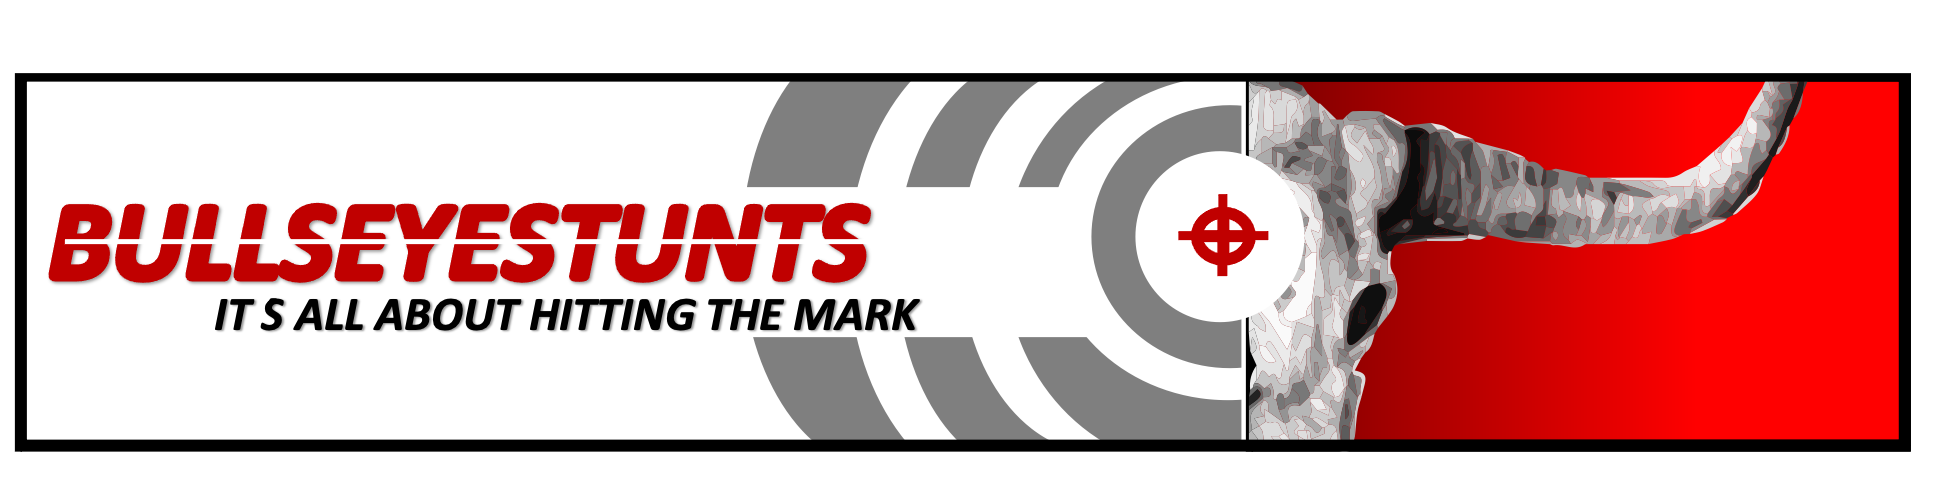 http://www.emberafc.com/wp-content/uploads/2021/07/Lauro-Logo.png